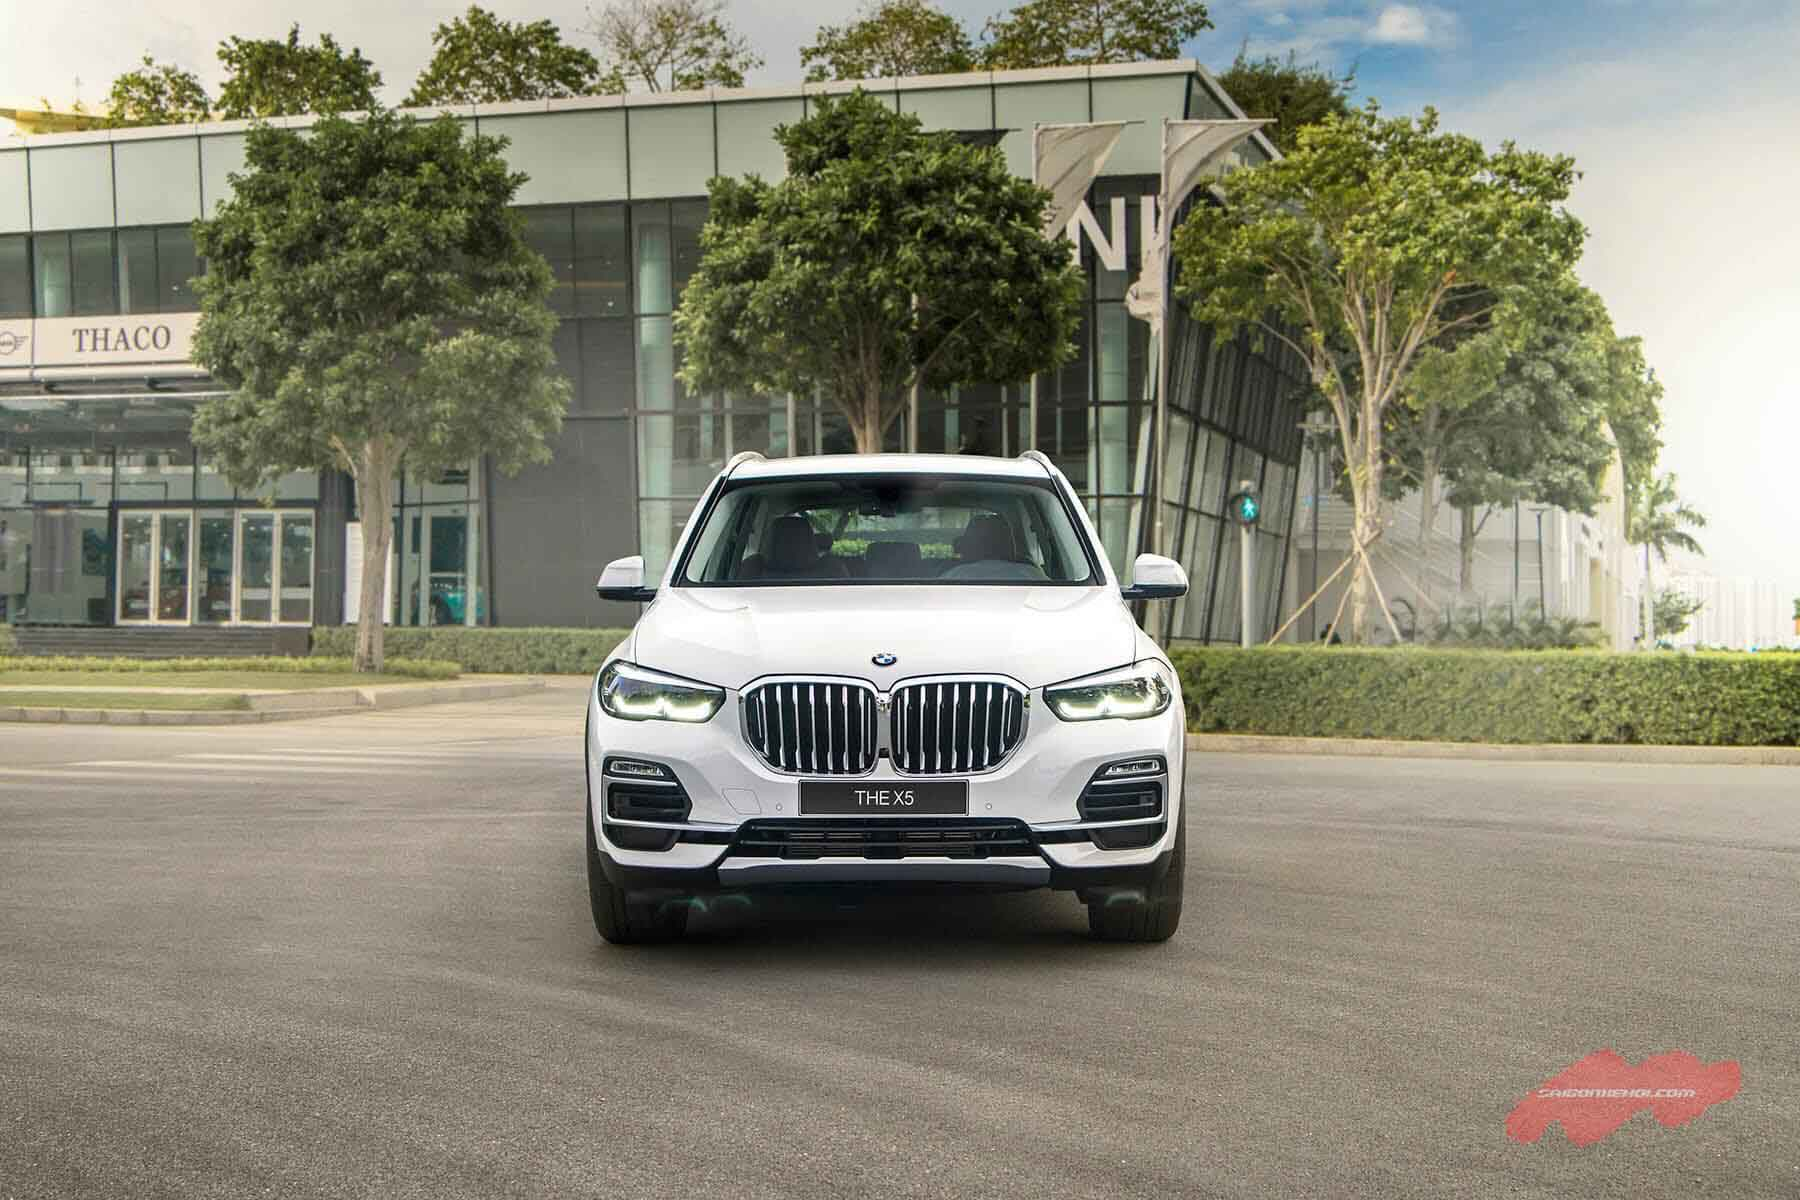 Ngoại thất xe BMW X5 All new 2020